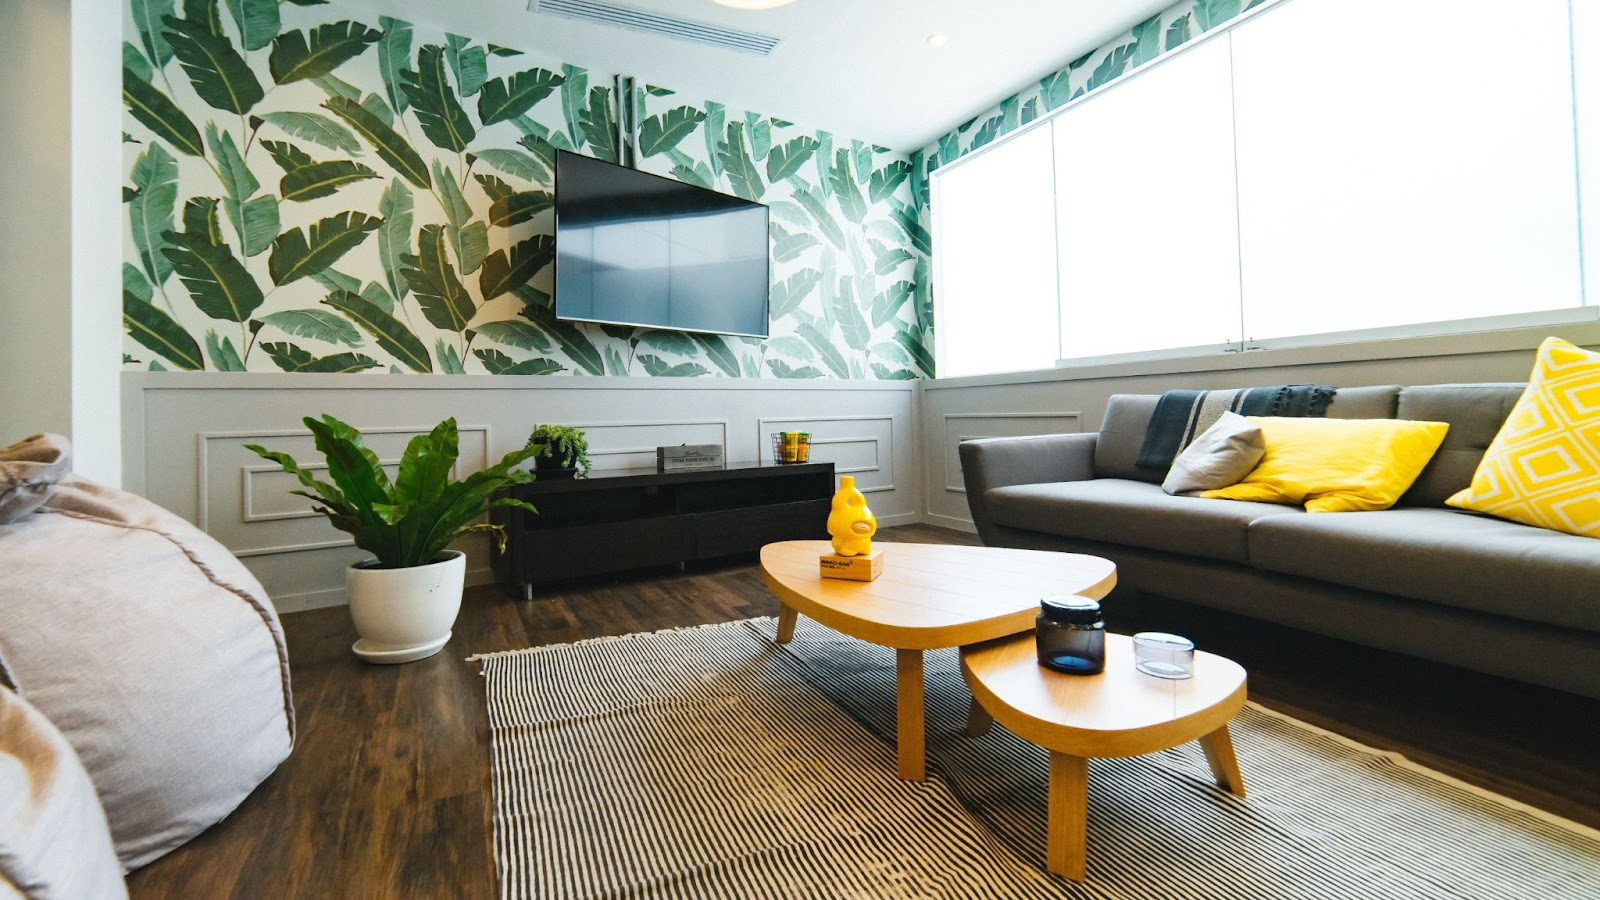 design ideas, interior design, diy, staging a home